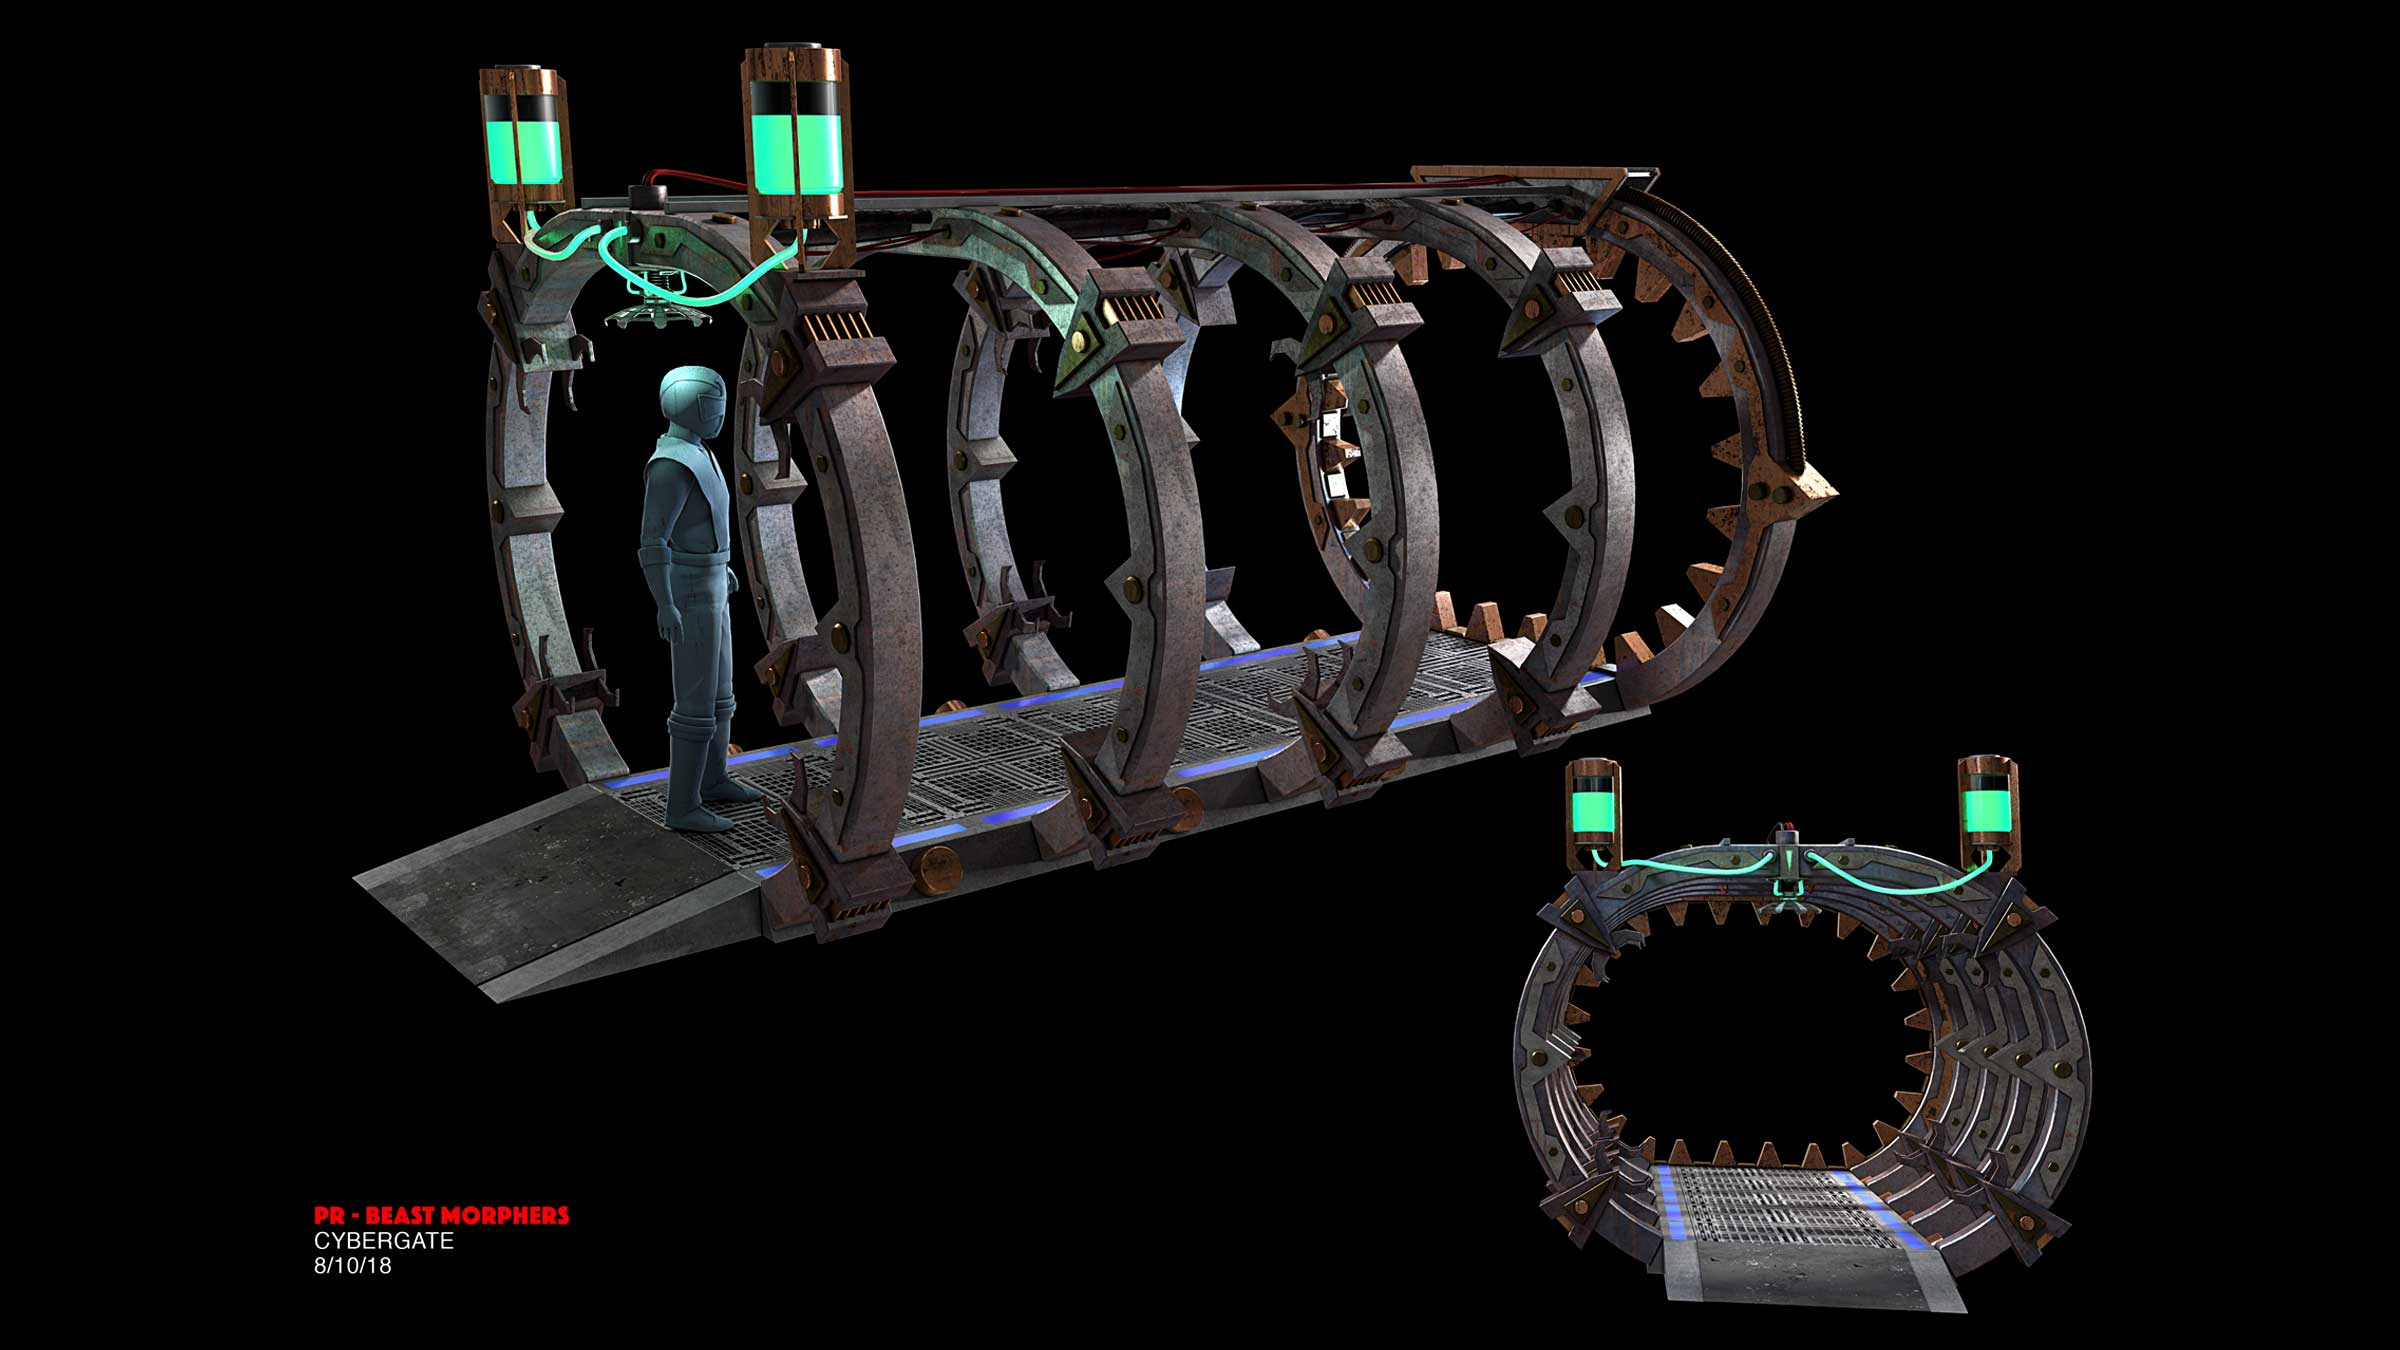 Cybergate Set Design - Concept Sketch views